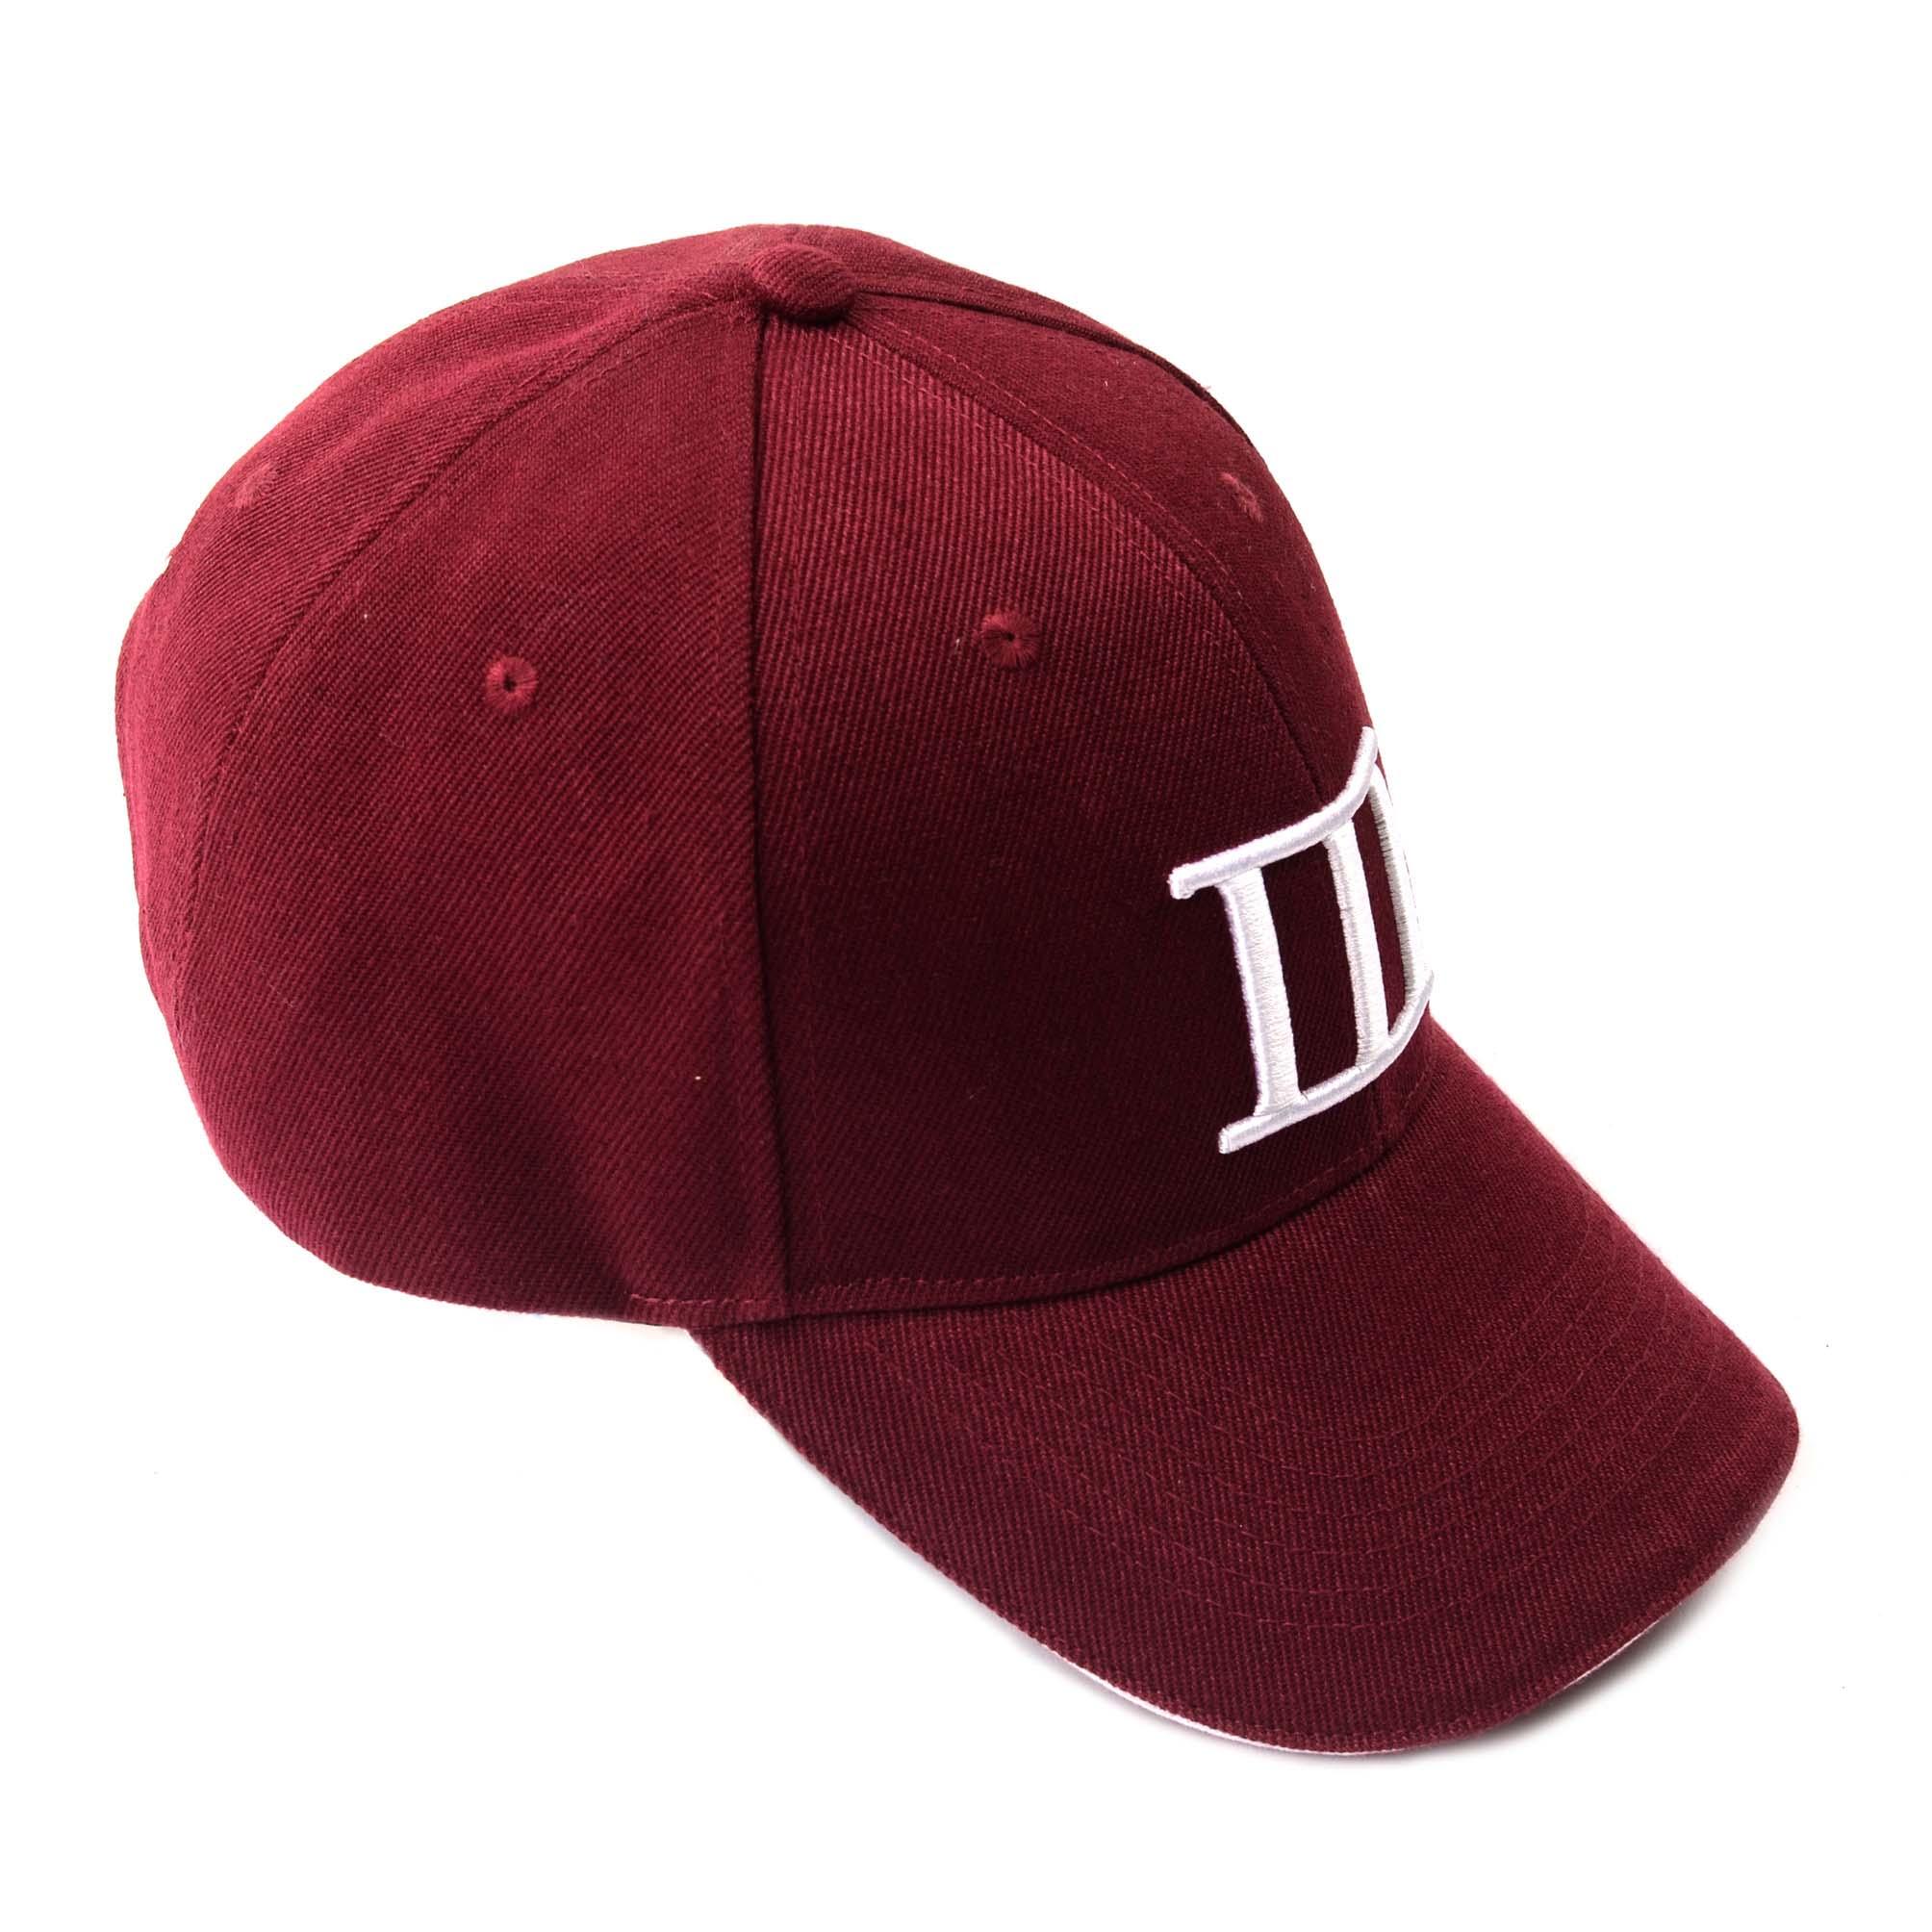 Burgundy Tresanti cap